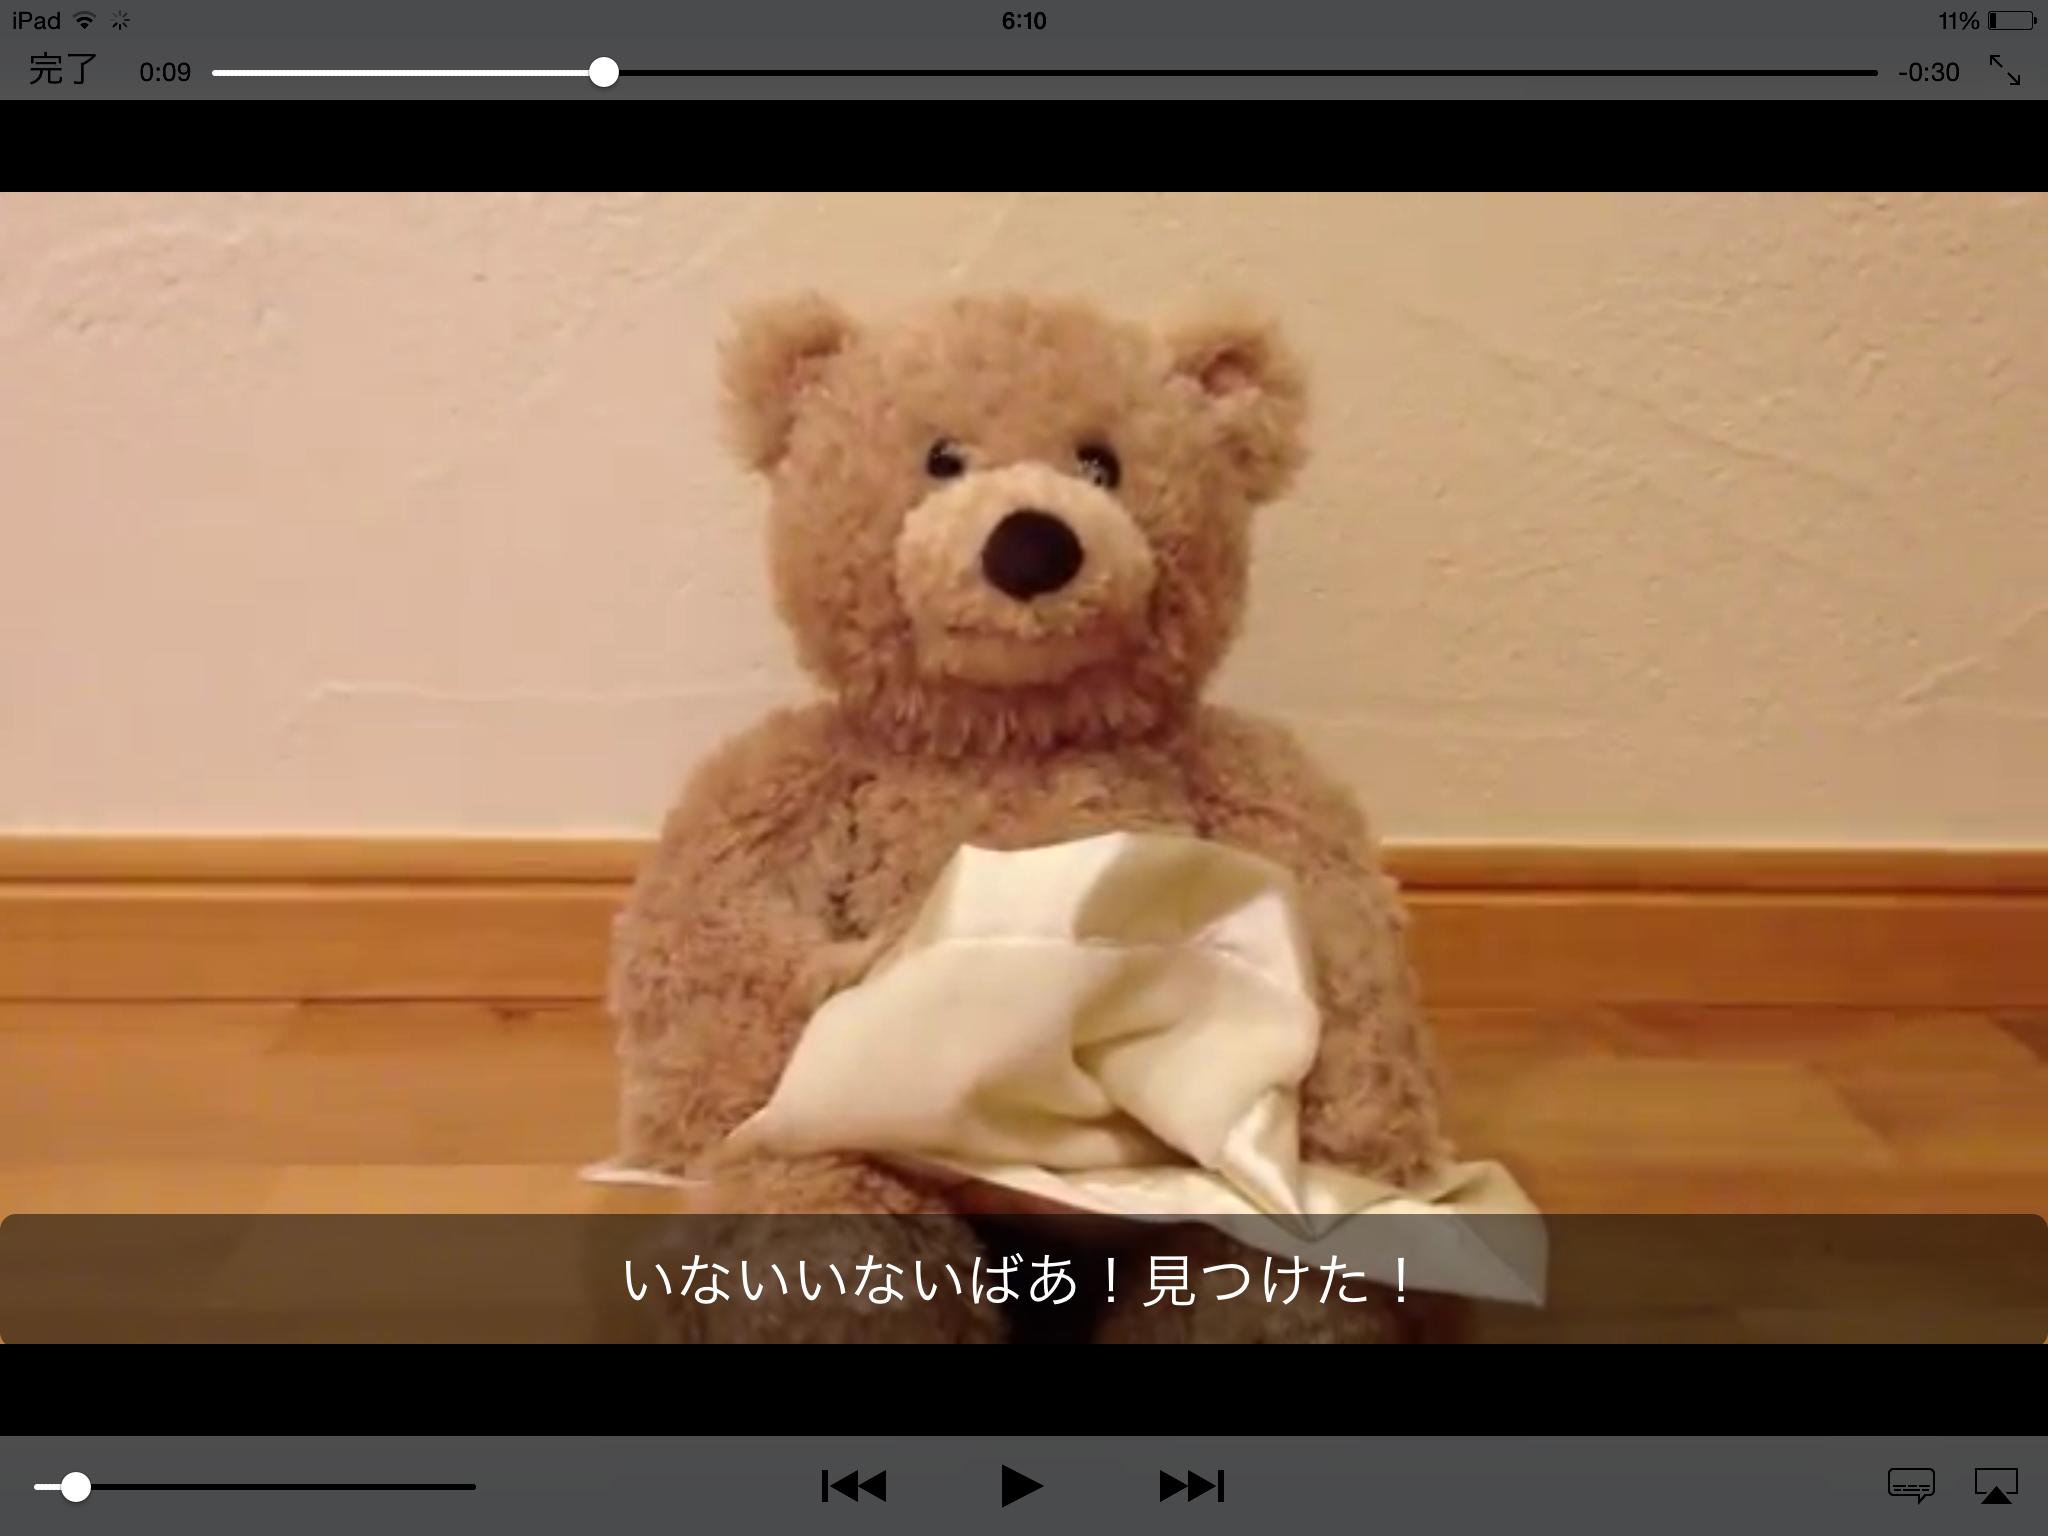 iPad での動画再生 (iOS 標準動画プレーヤーでの再生)